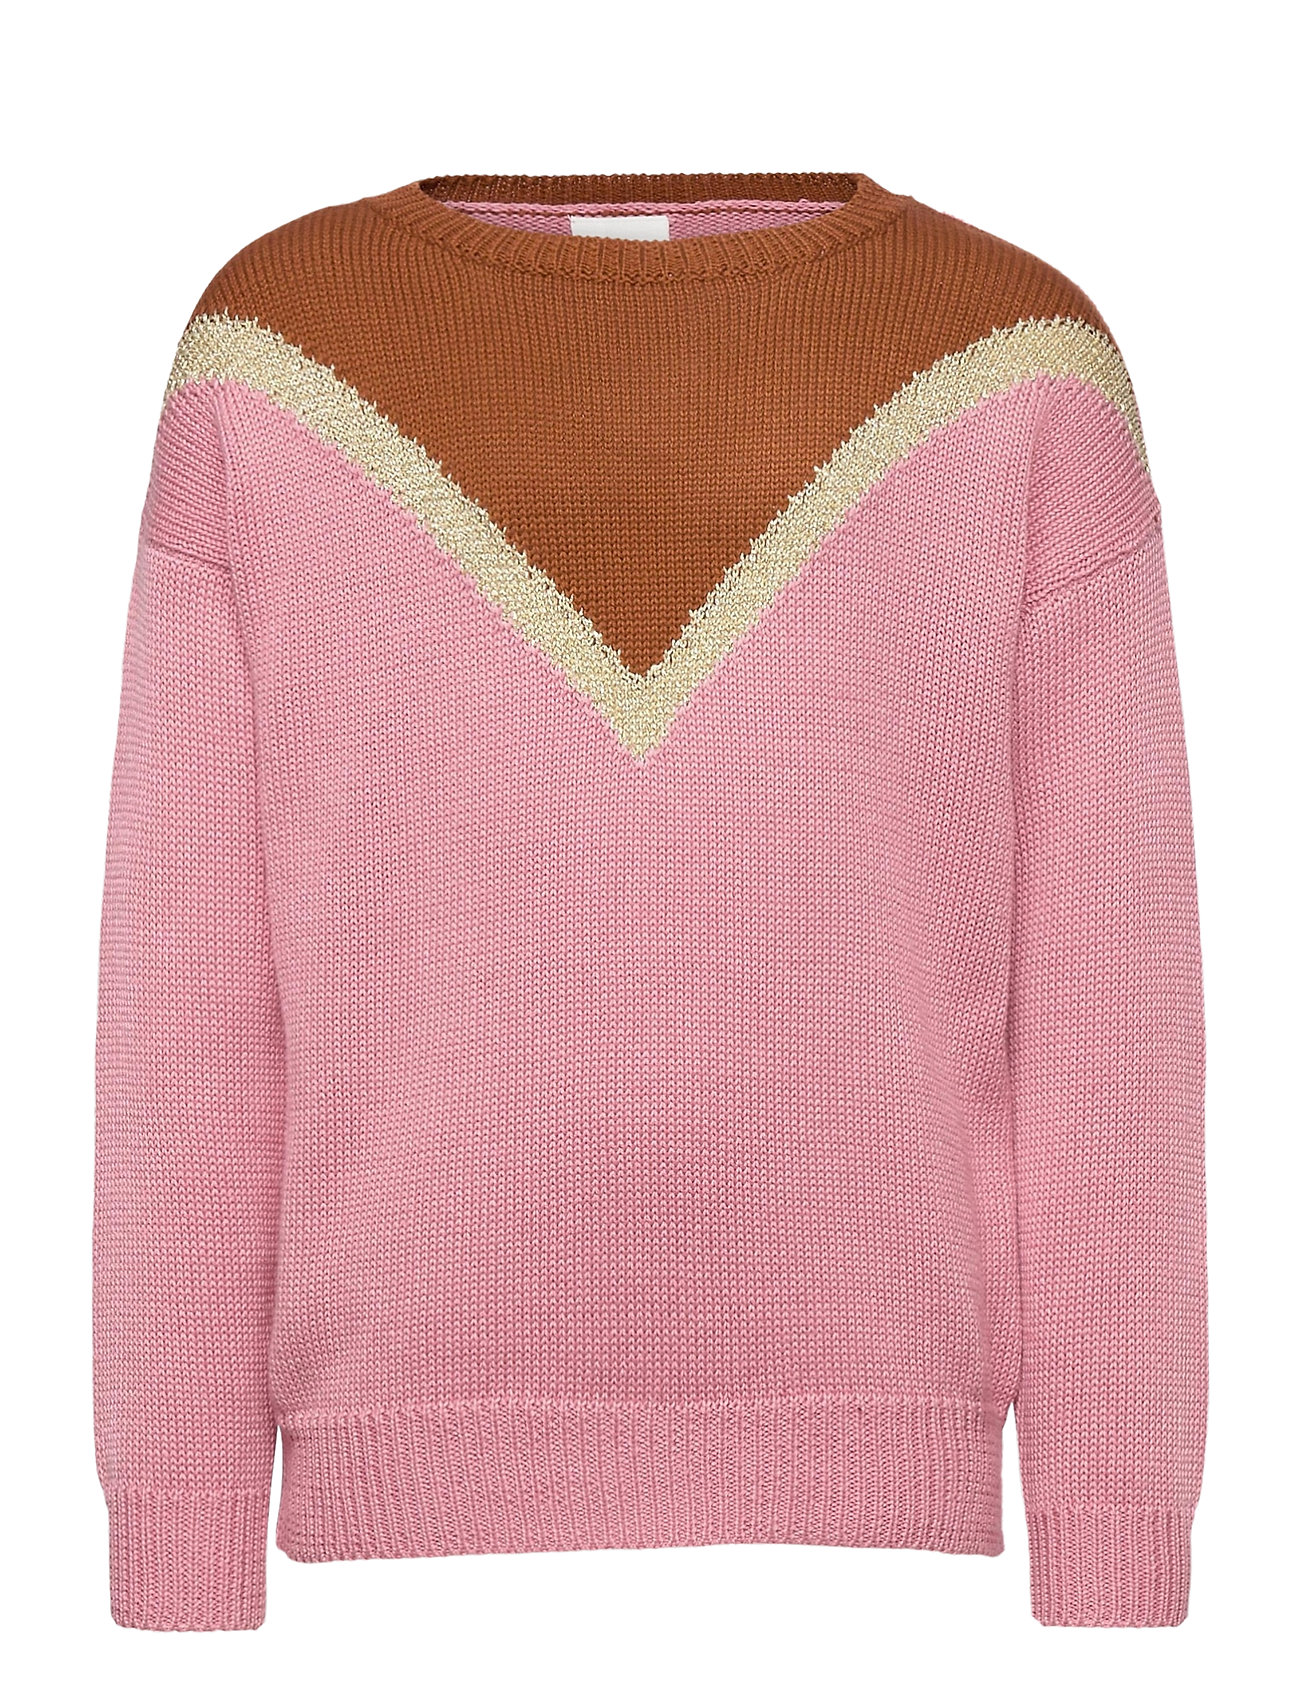 Image of Ratina Knit Pullover Pullover Striktrøje Lyserød The New (3440210421)